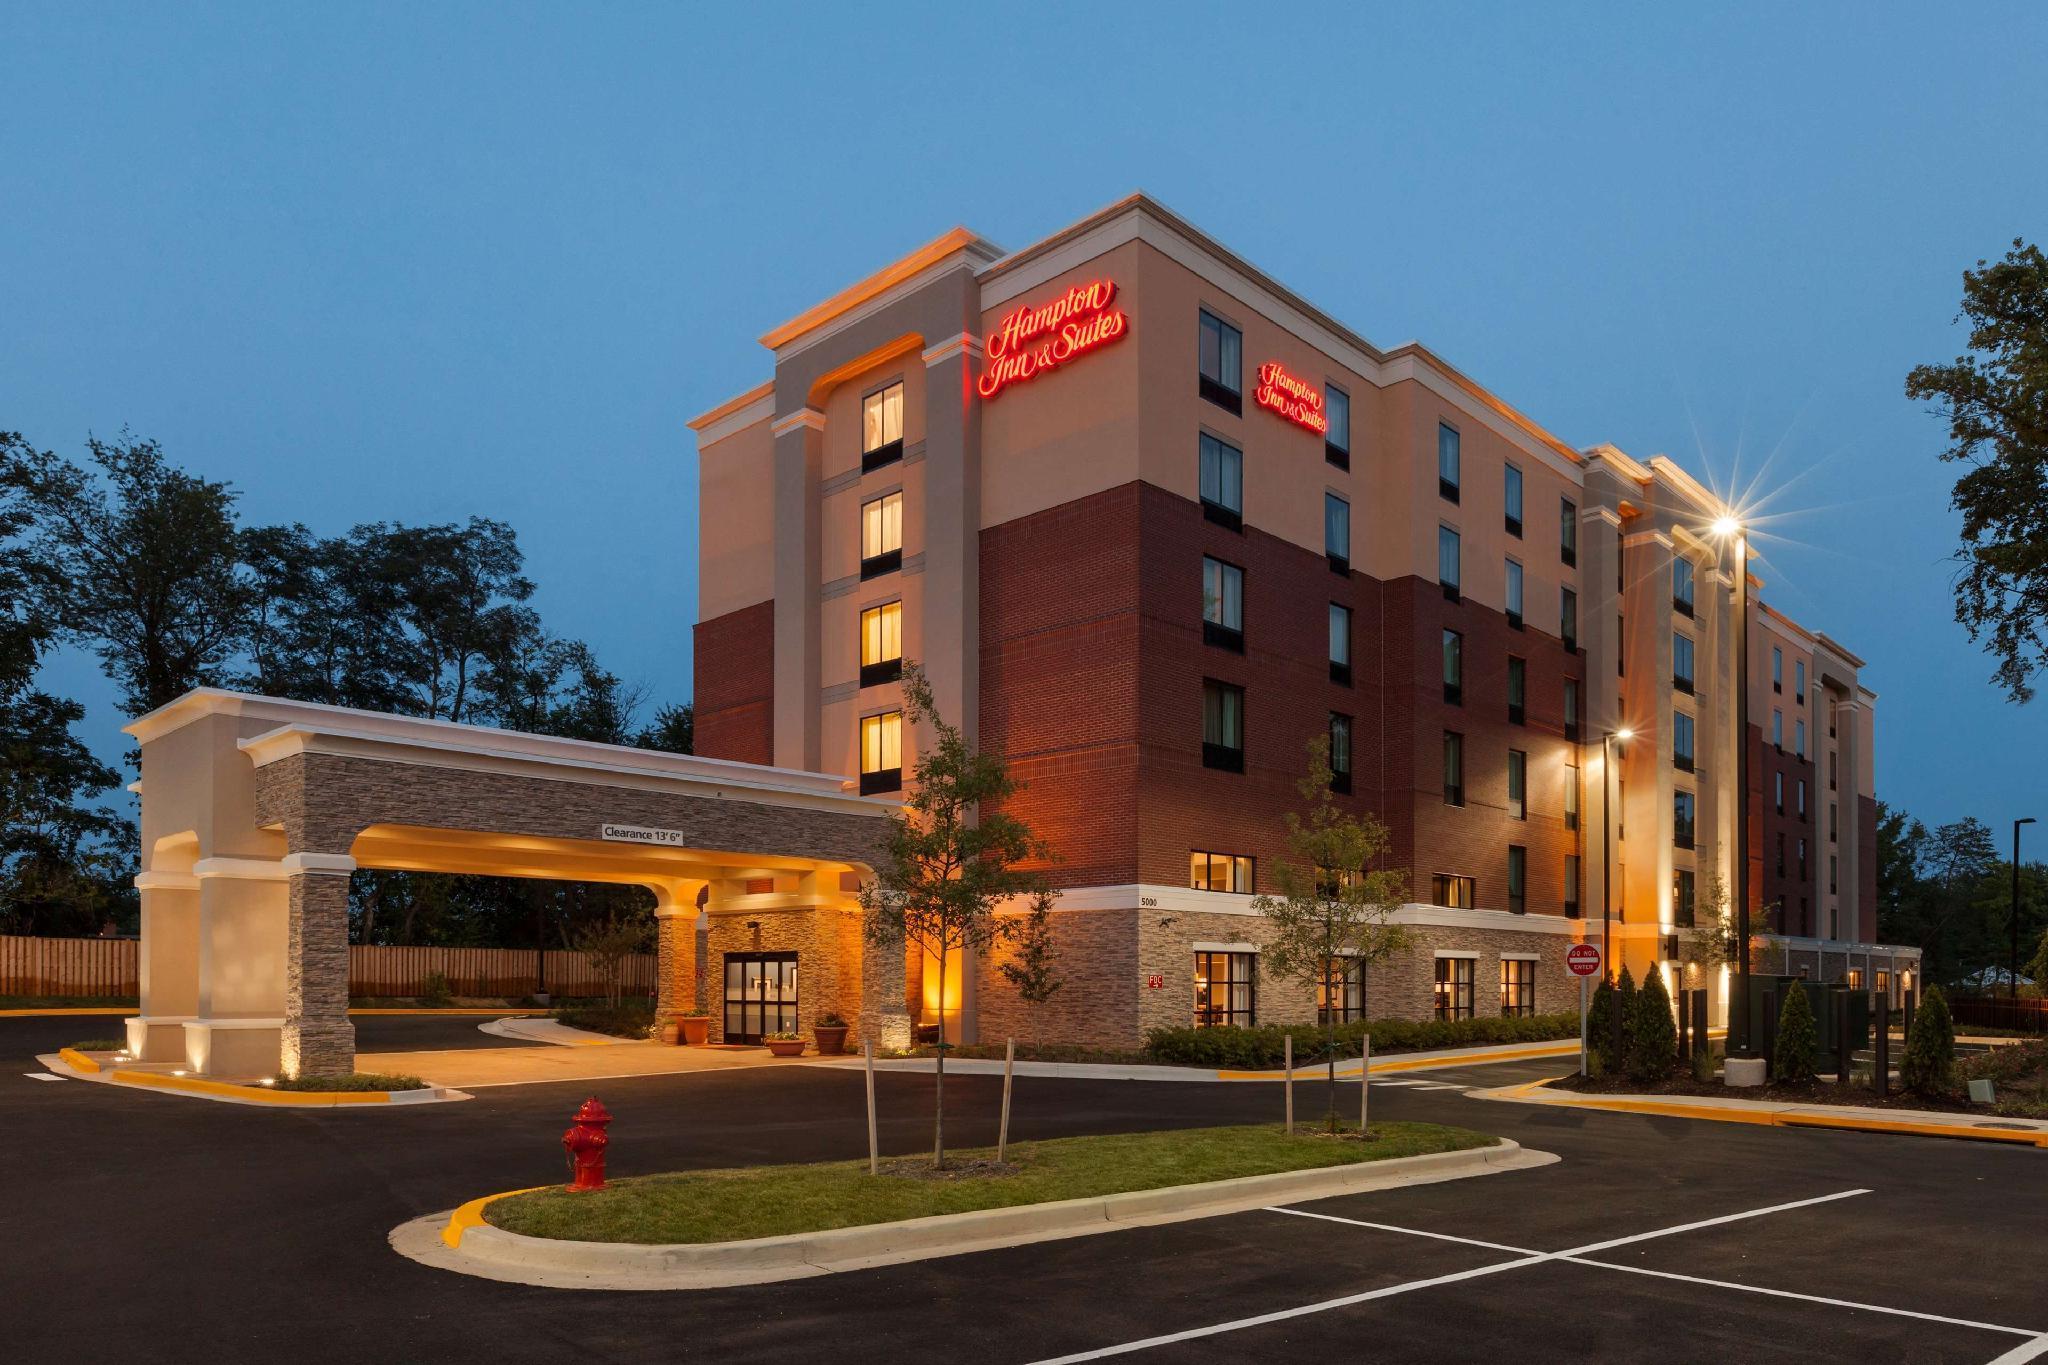 Hampton Inn And Suites Camp Springs Andrews AFB